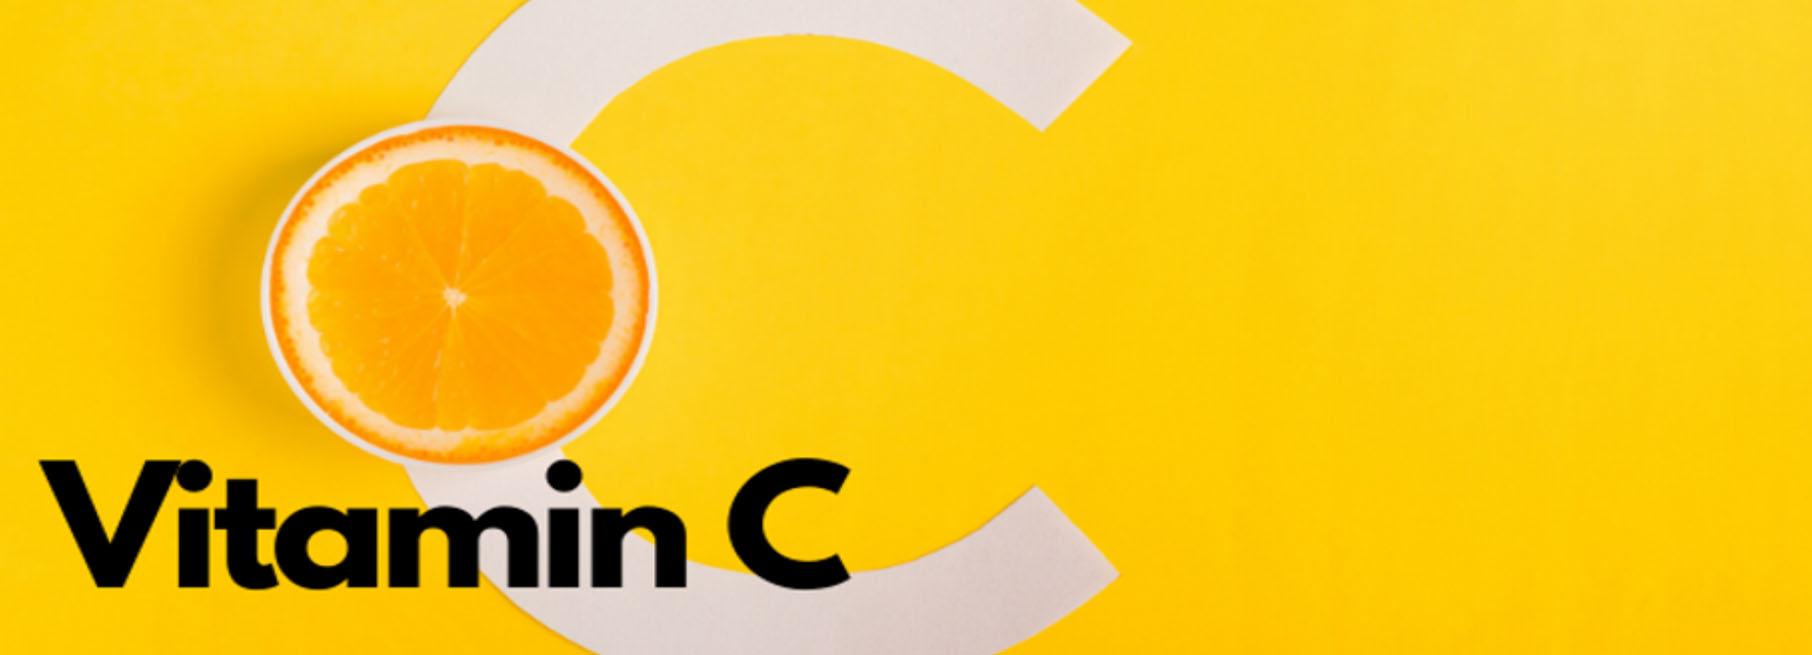 vitamin c large image